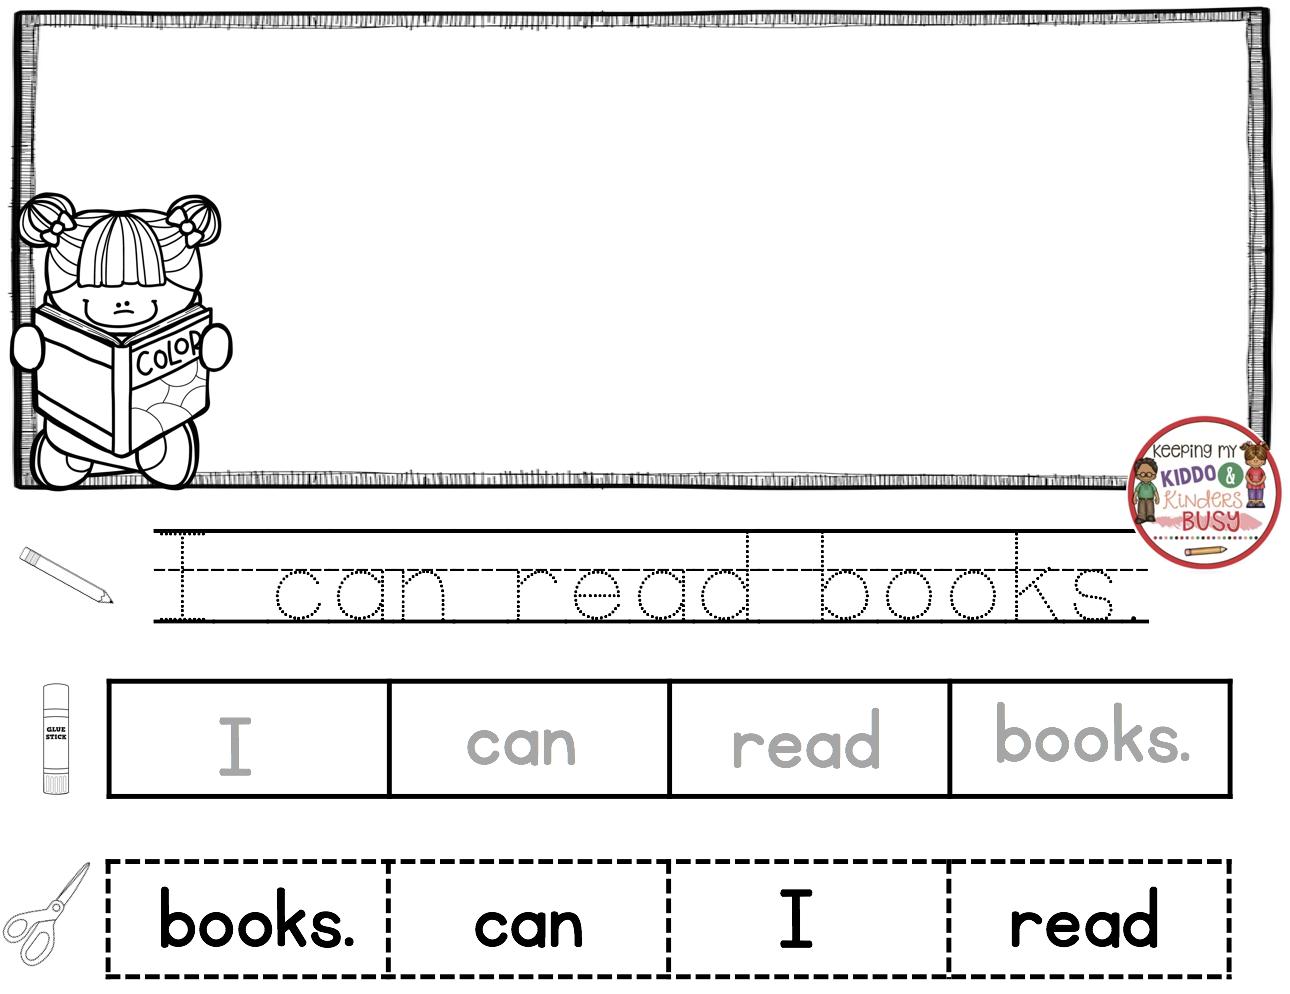 Reading And Writing Back To School In Kindergarten Free Week Keeping My Kiddo Busy Writing Printables Writing Kindergarten Reading [ 994 x 1290 Pixel ]